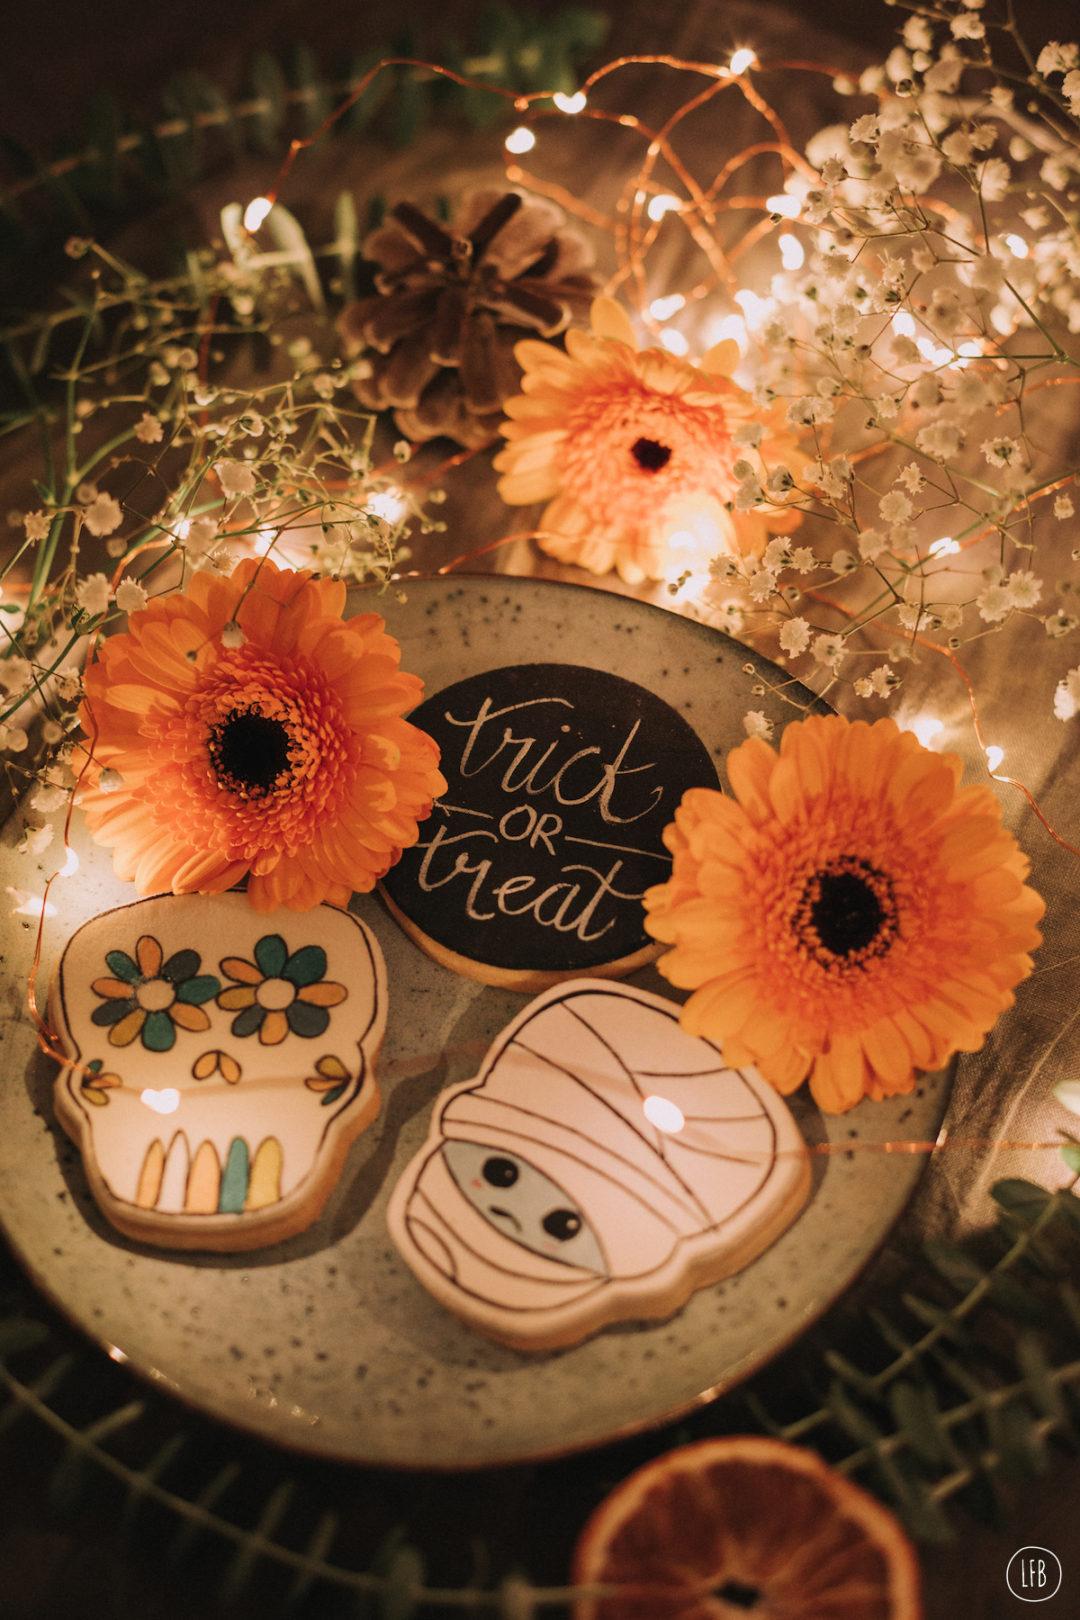 Cookies from Herr Max - travel treats - rae tashman - lovefromberlin.net